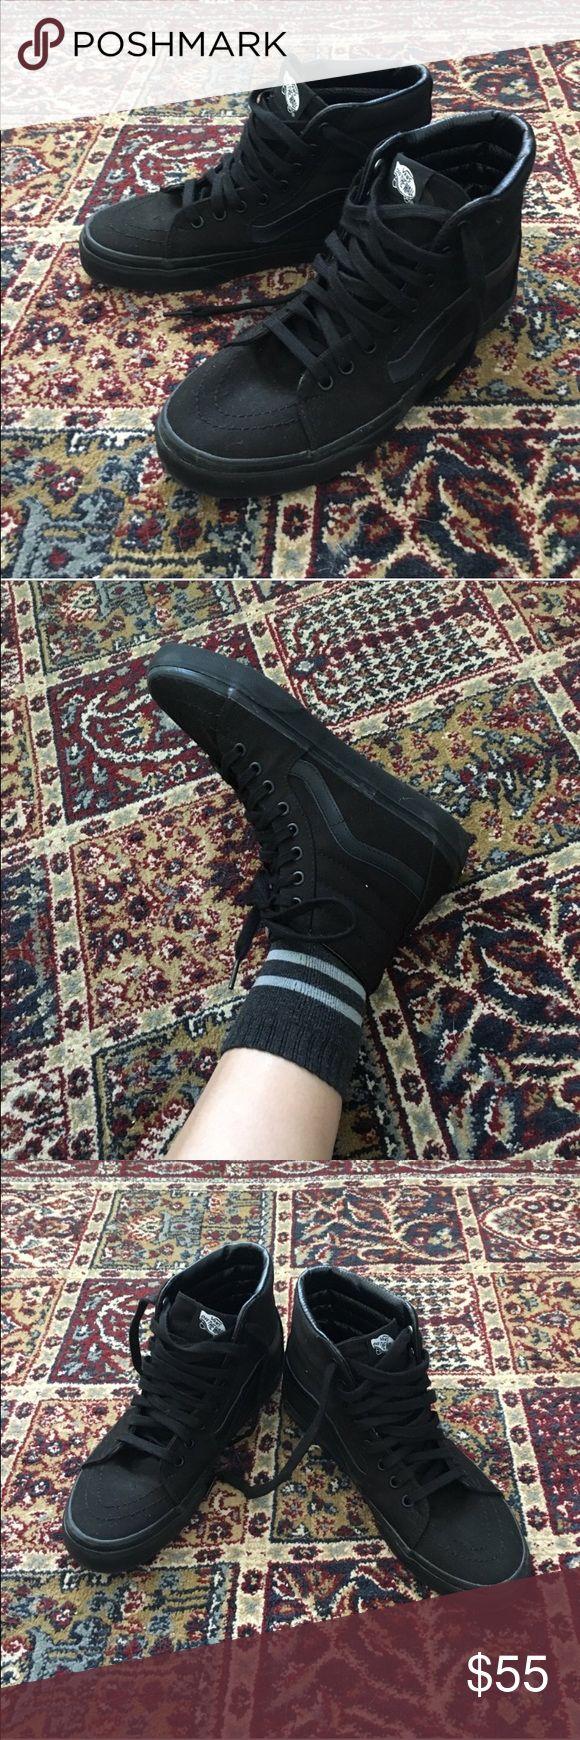 All black high top vans Barely worn all black vans skate highs. Women's size 8.5 and men's 7 #vans #skatehighs #allblack #sk8hi Vans Shoes Sneakers